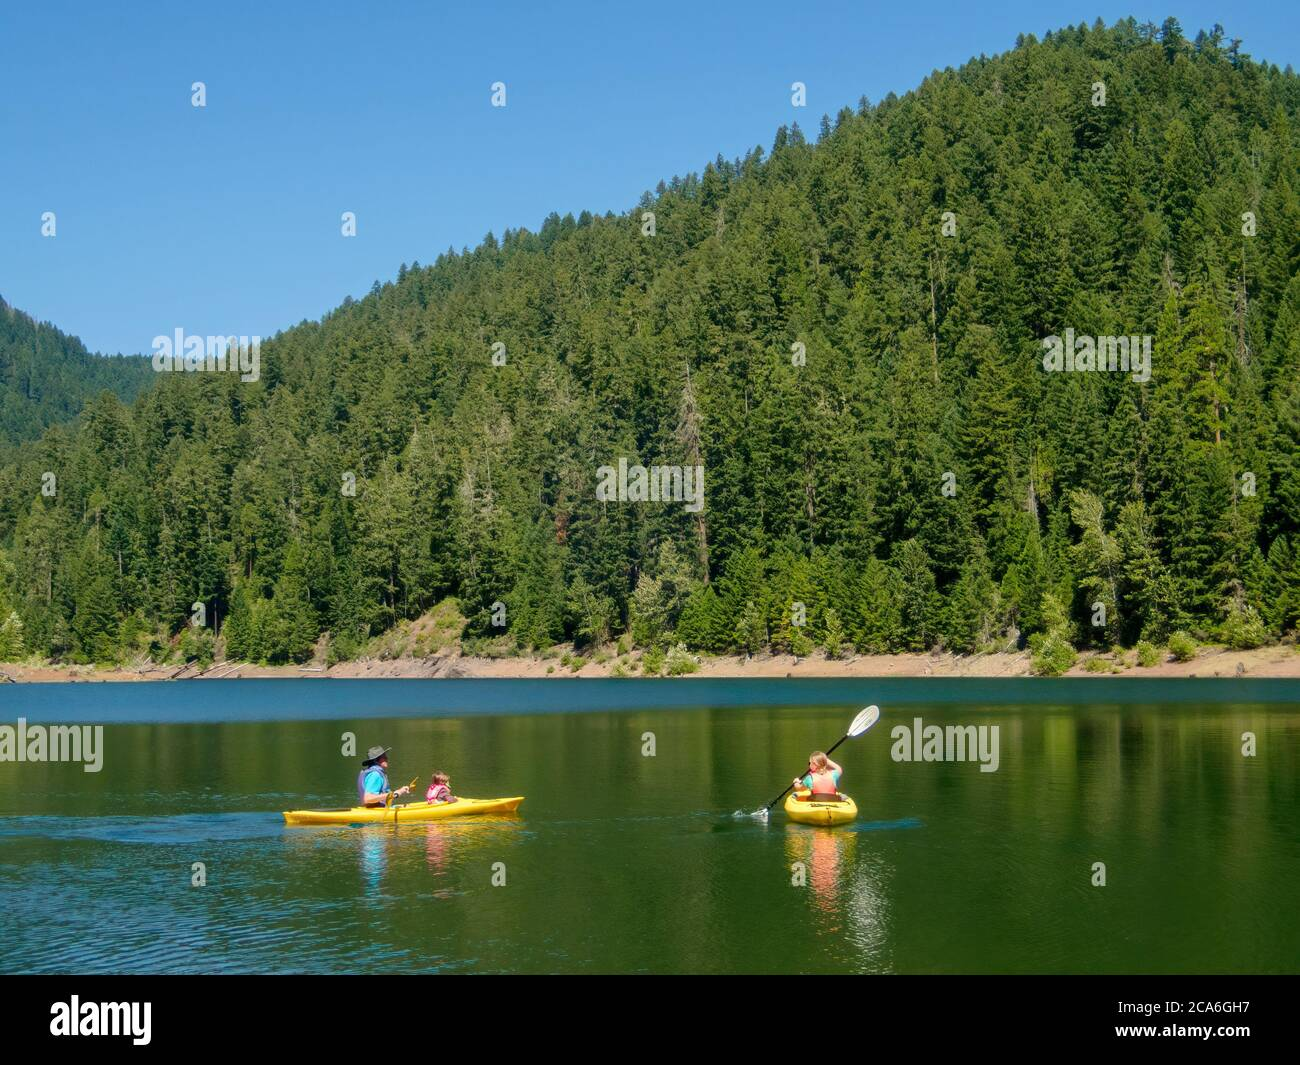 Hunter, Chester y Anabel kayak en Larison Cove, Hills Creek Reservoir, Willamette National Forest, Oregon. Foto de stock